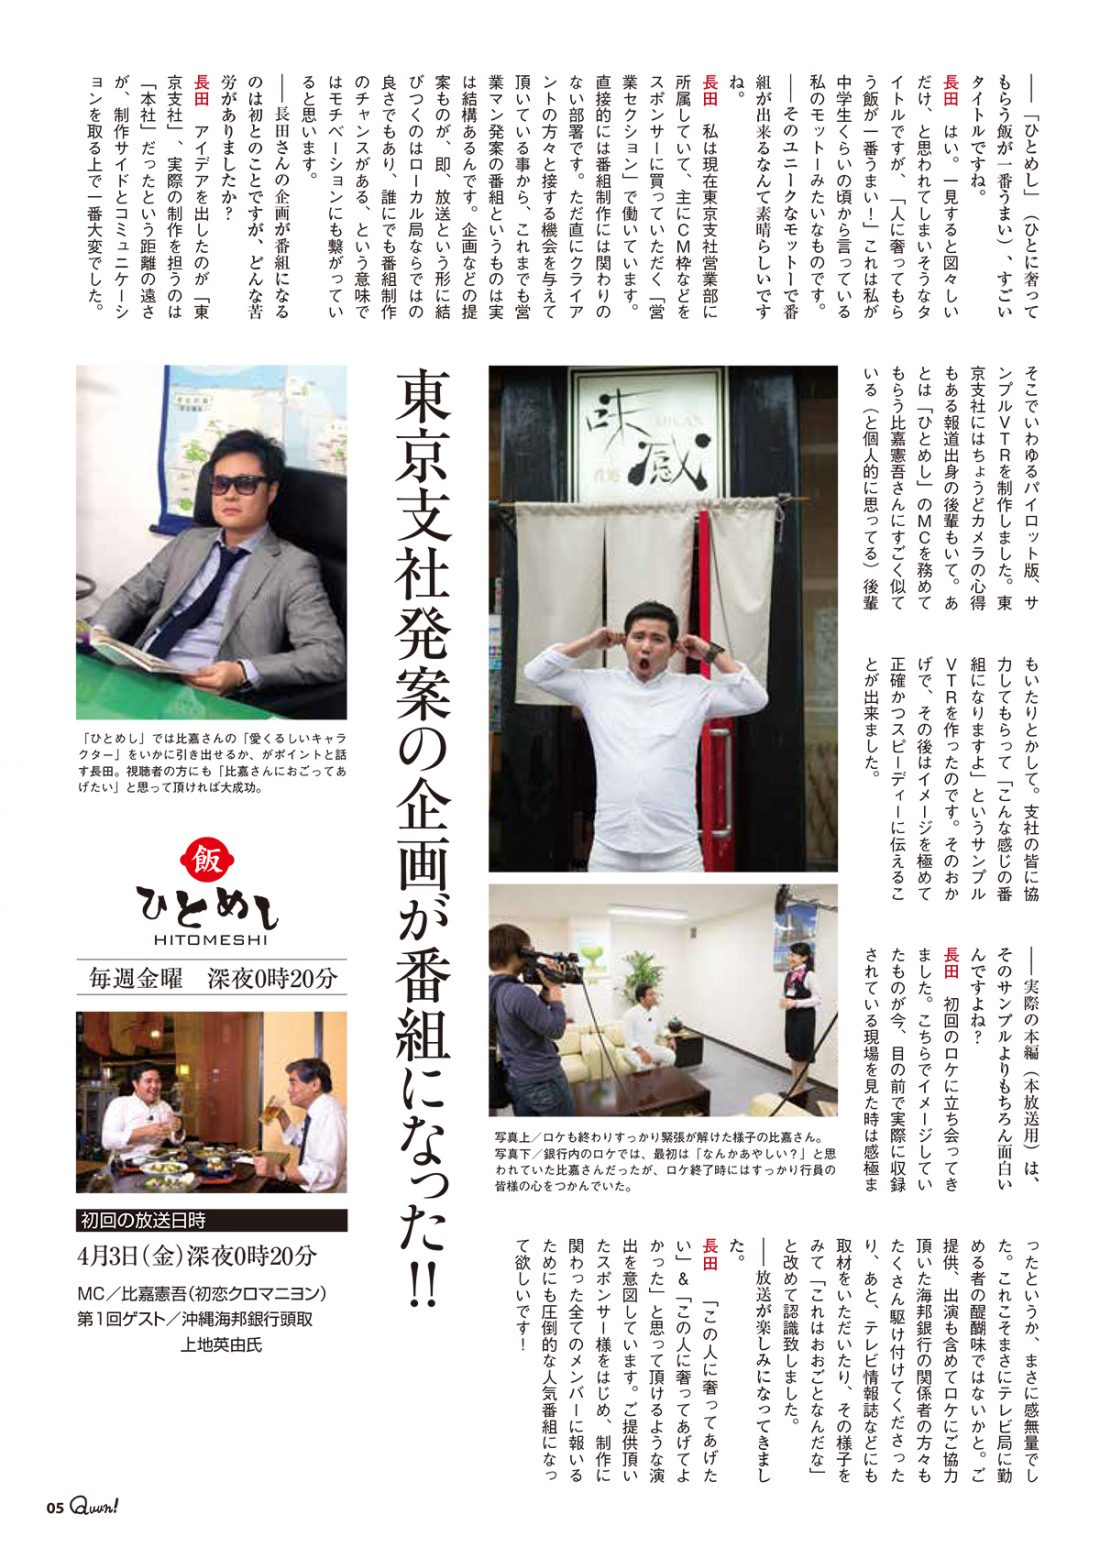 https://www.qab.co.jp/qgoro/wp-content/uploads/quun_0307-1100x1558.jpg